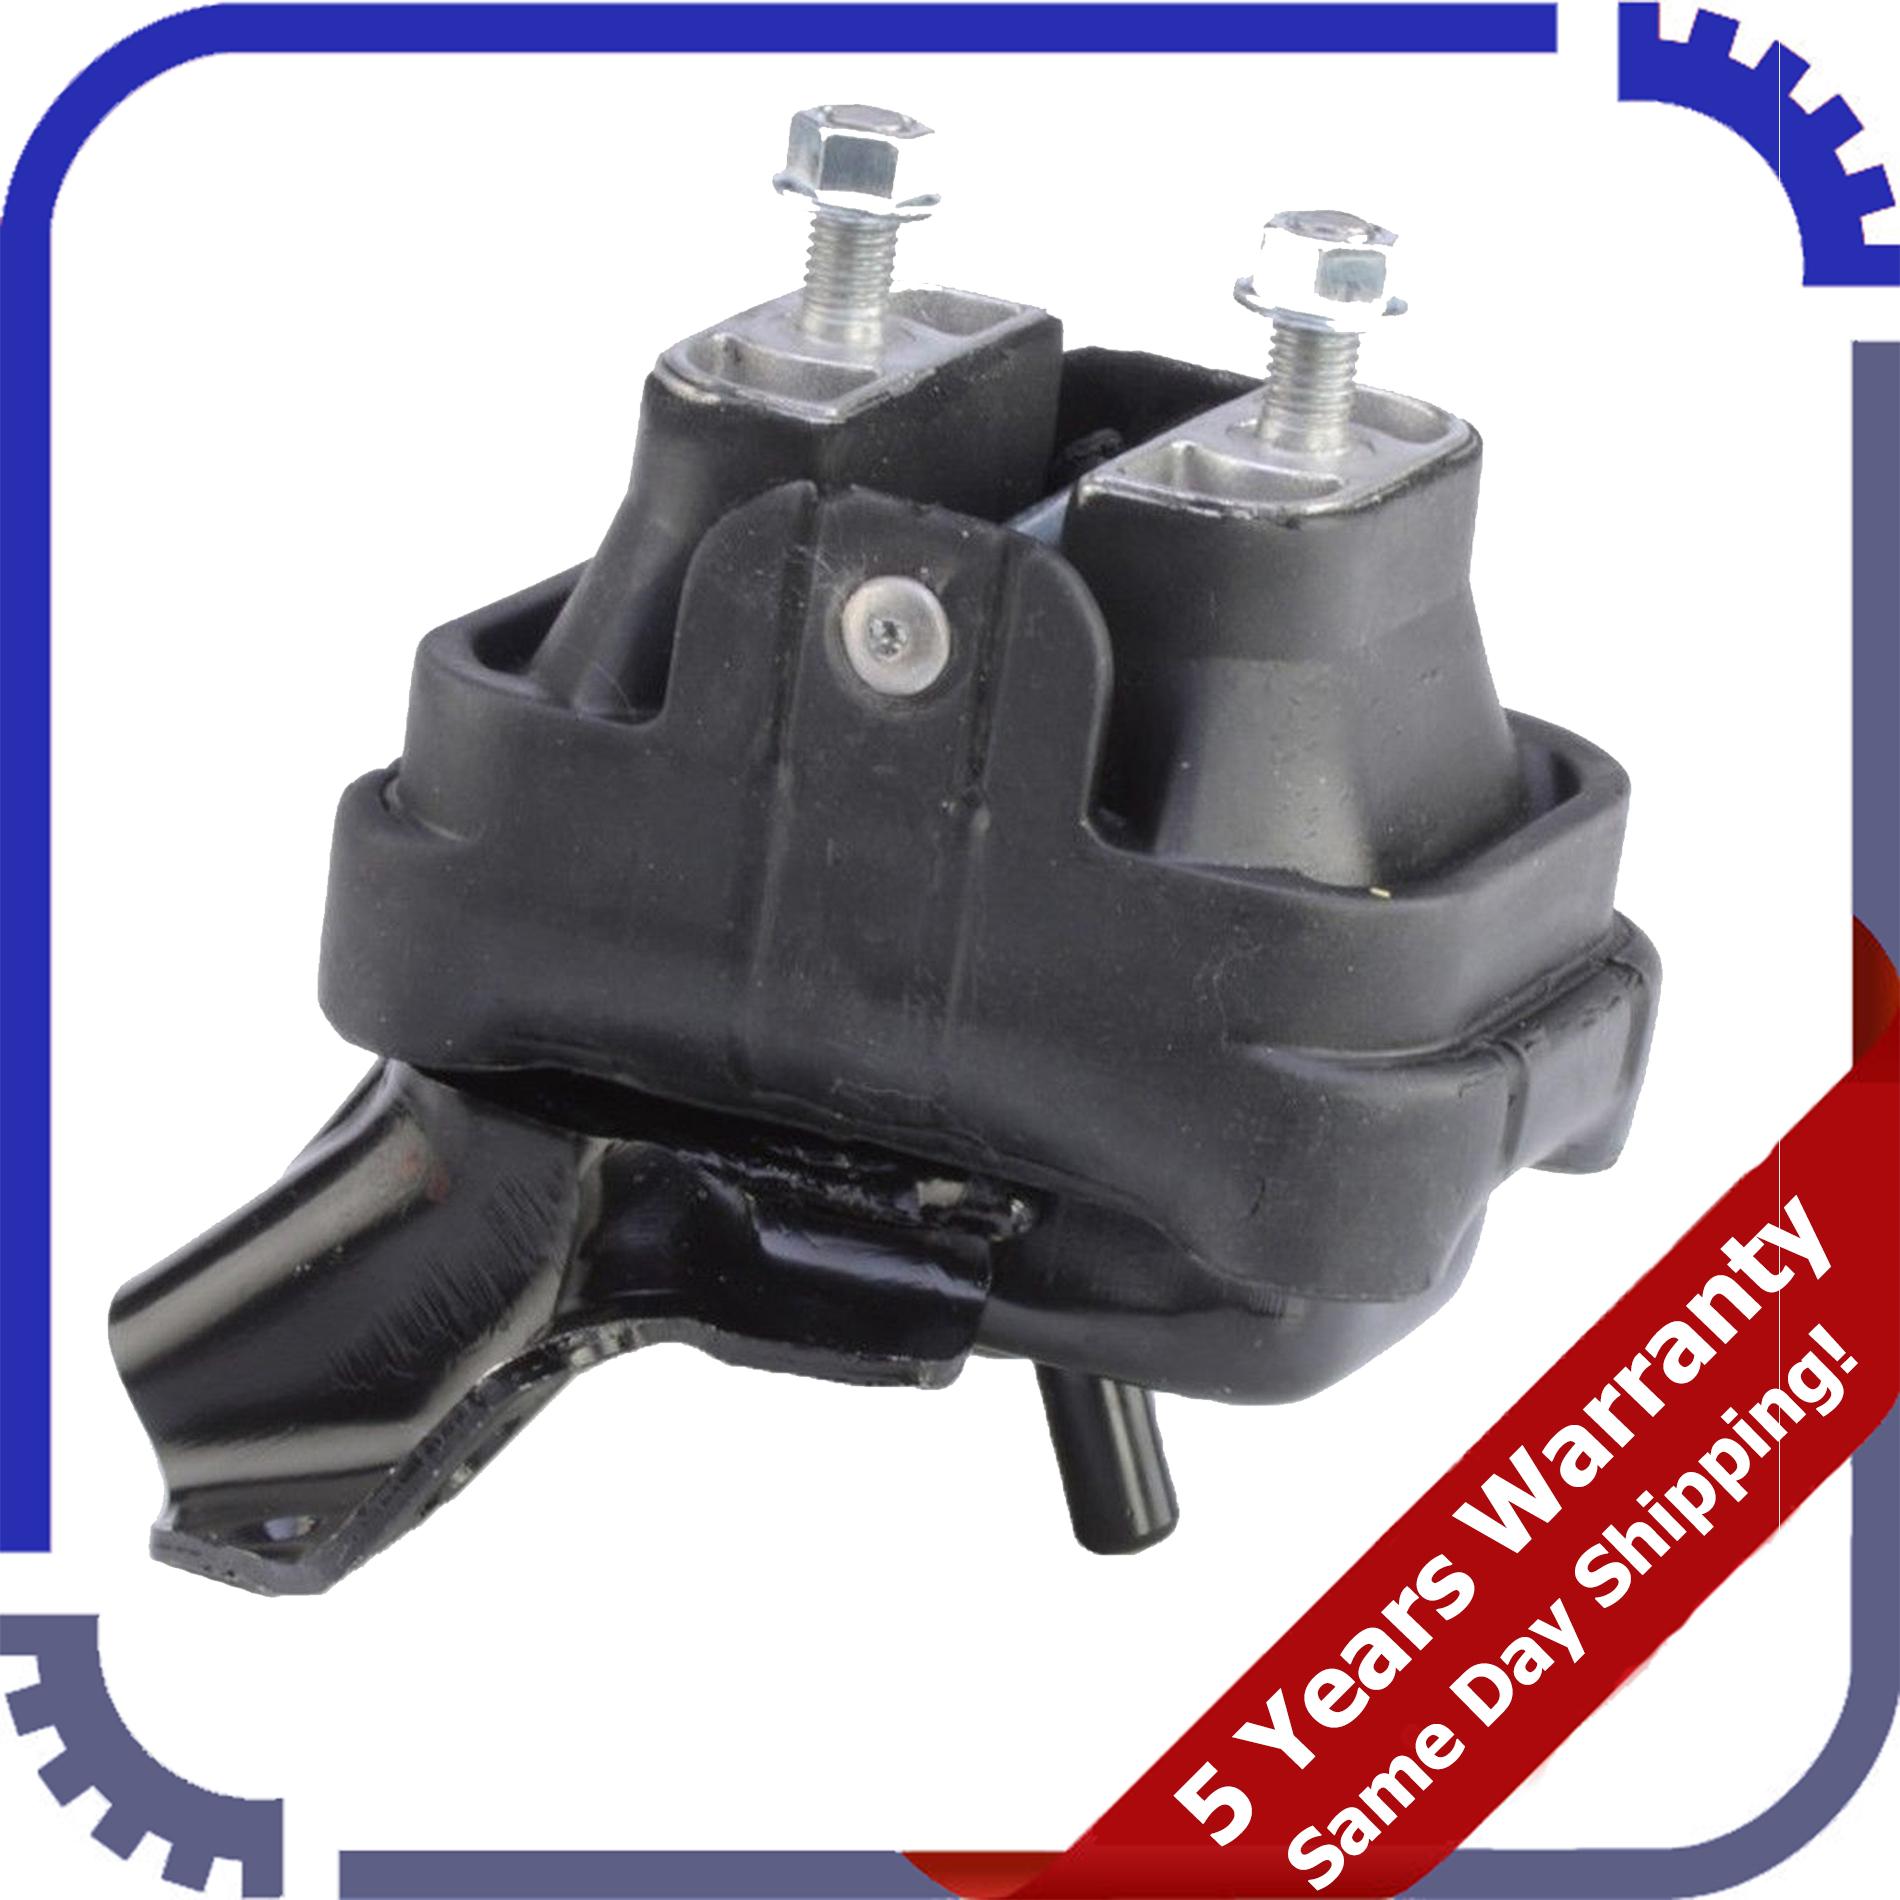 Anchor Motor /& Transmission Mount Kit for Cadillac Escalade 6.0L 6.2L 2007-2014